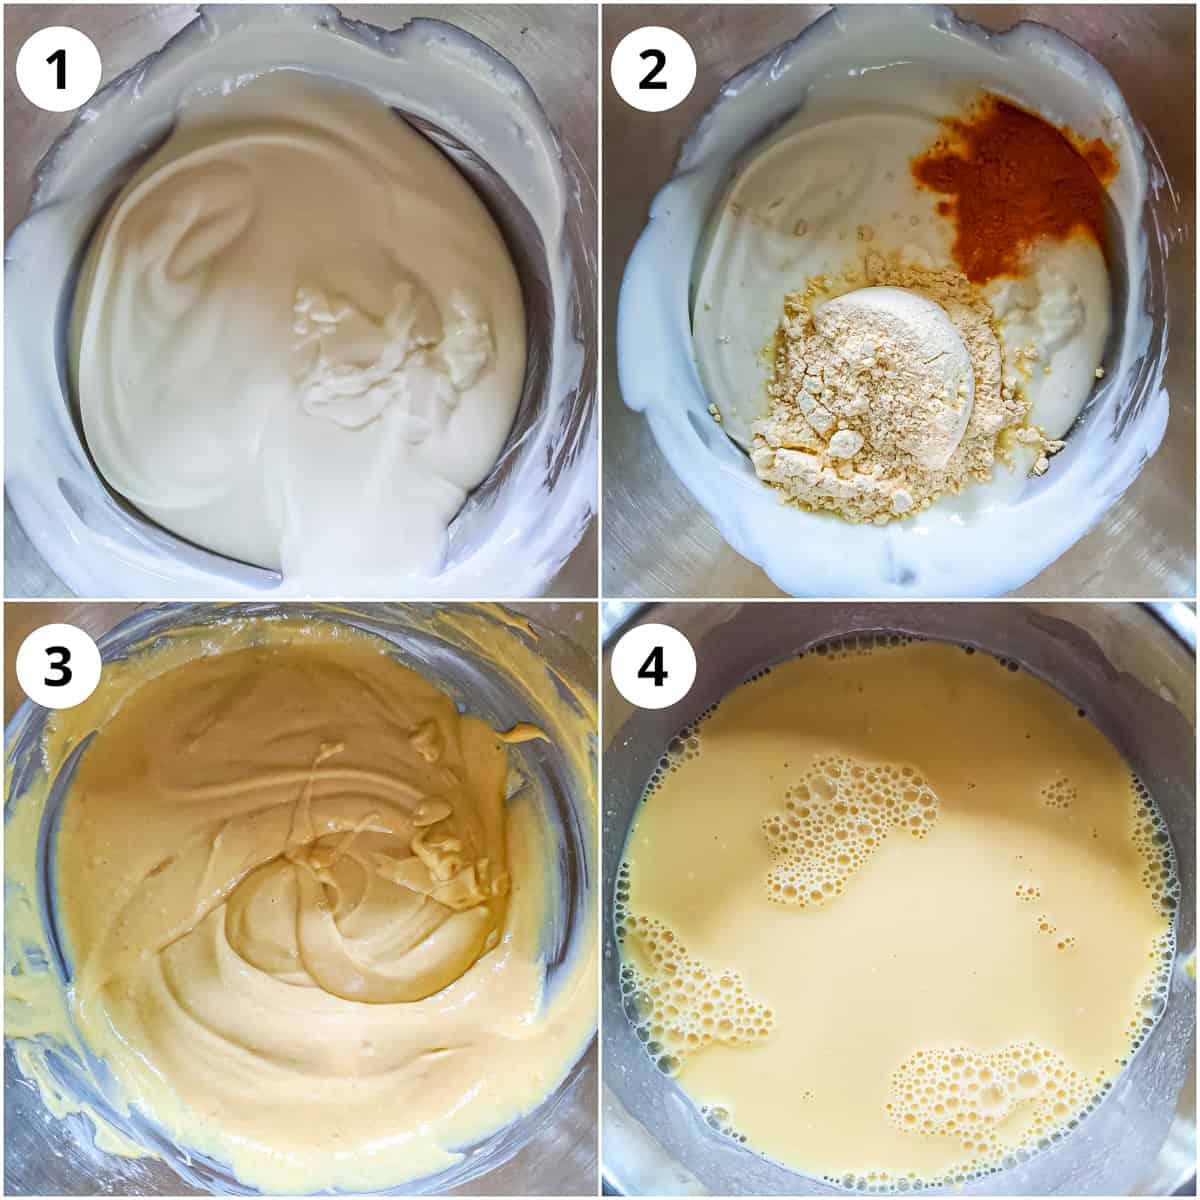 In a bowl, mixing yogurt, gram flour turmeric, salt. water to make batter